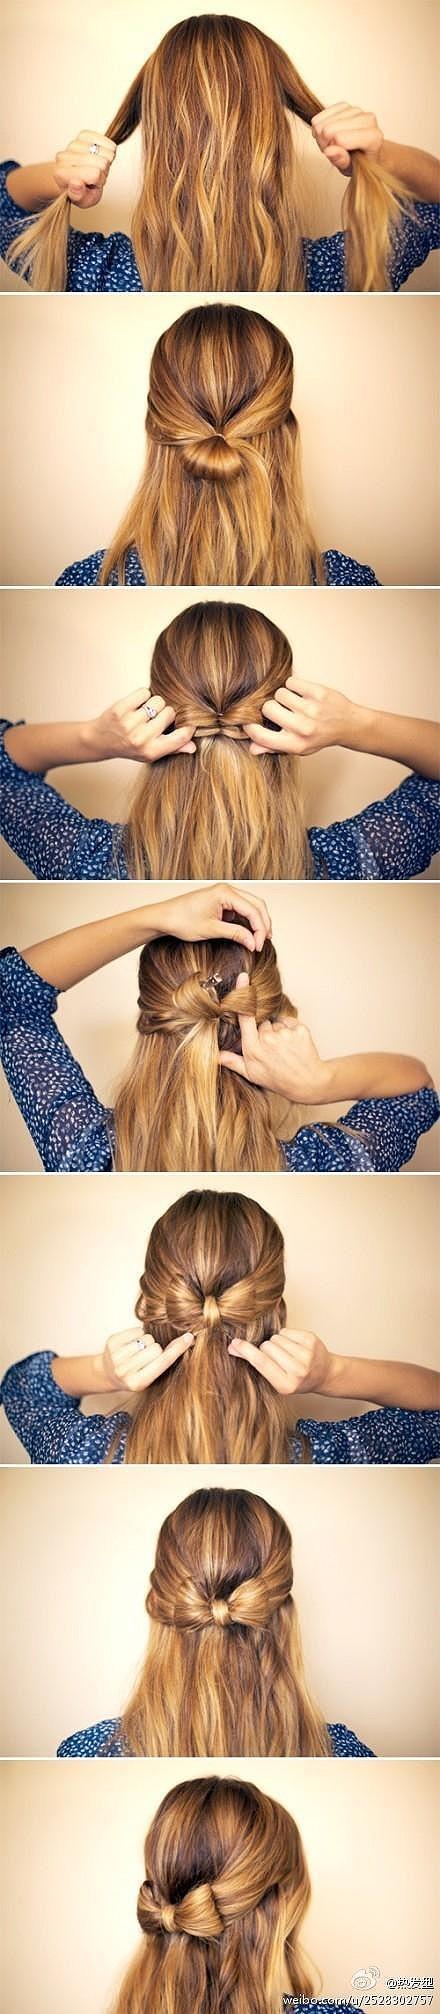 DIY hair bow...saw this on a little girl...so cute!